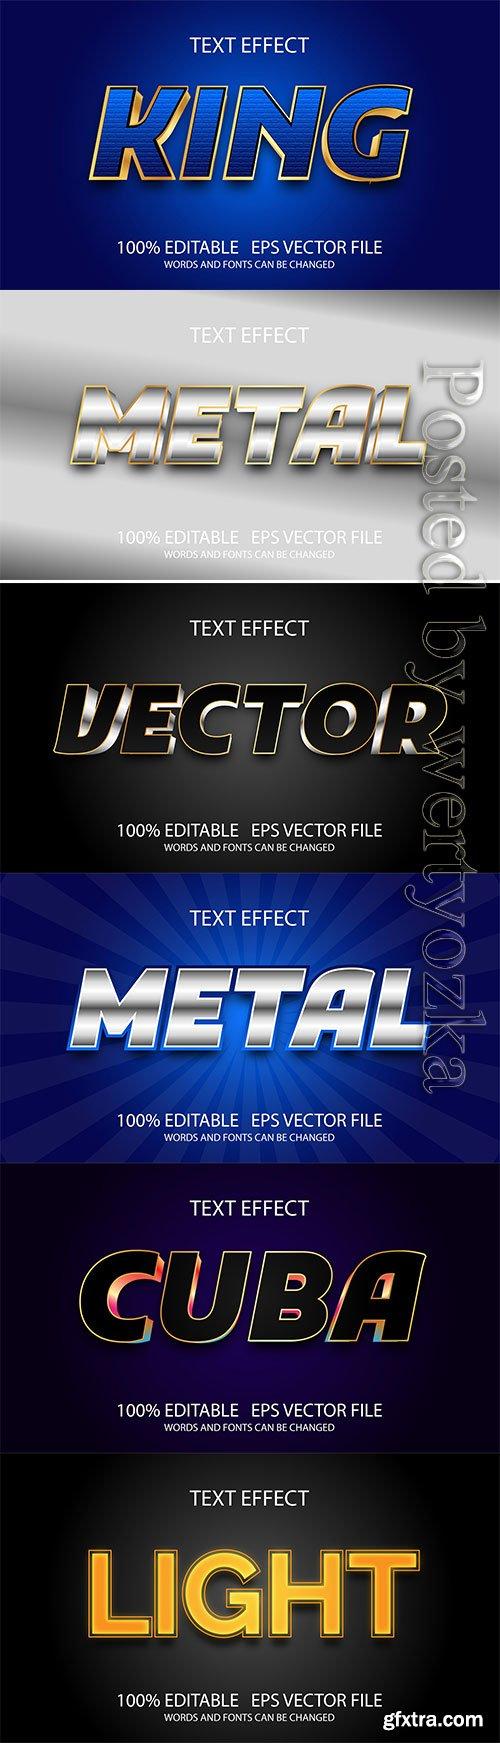 3d editable text style effect vector vol 256